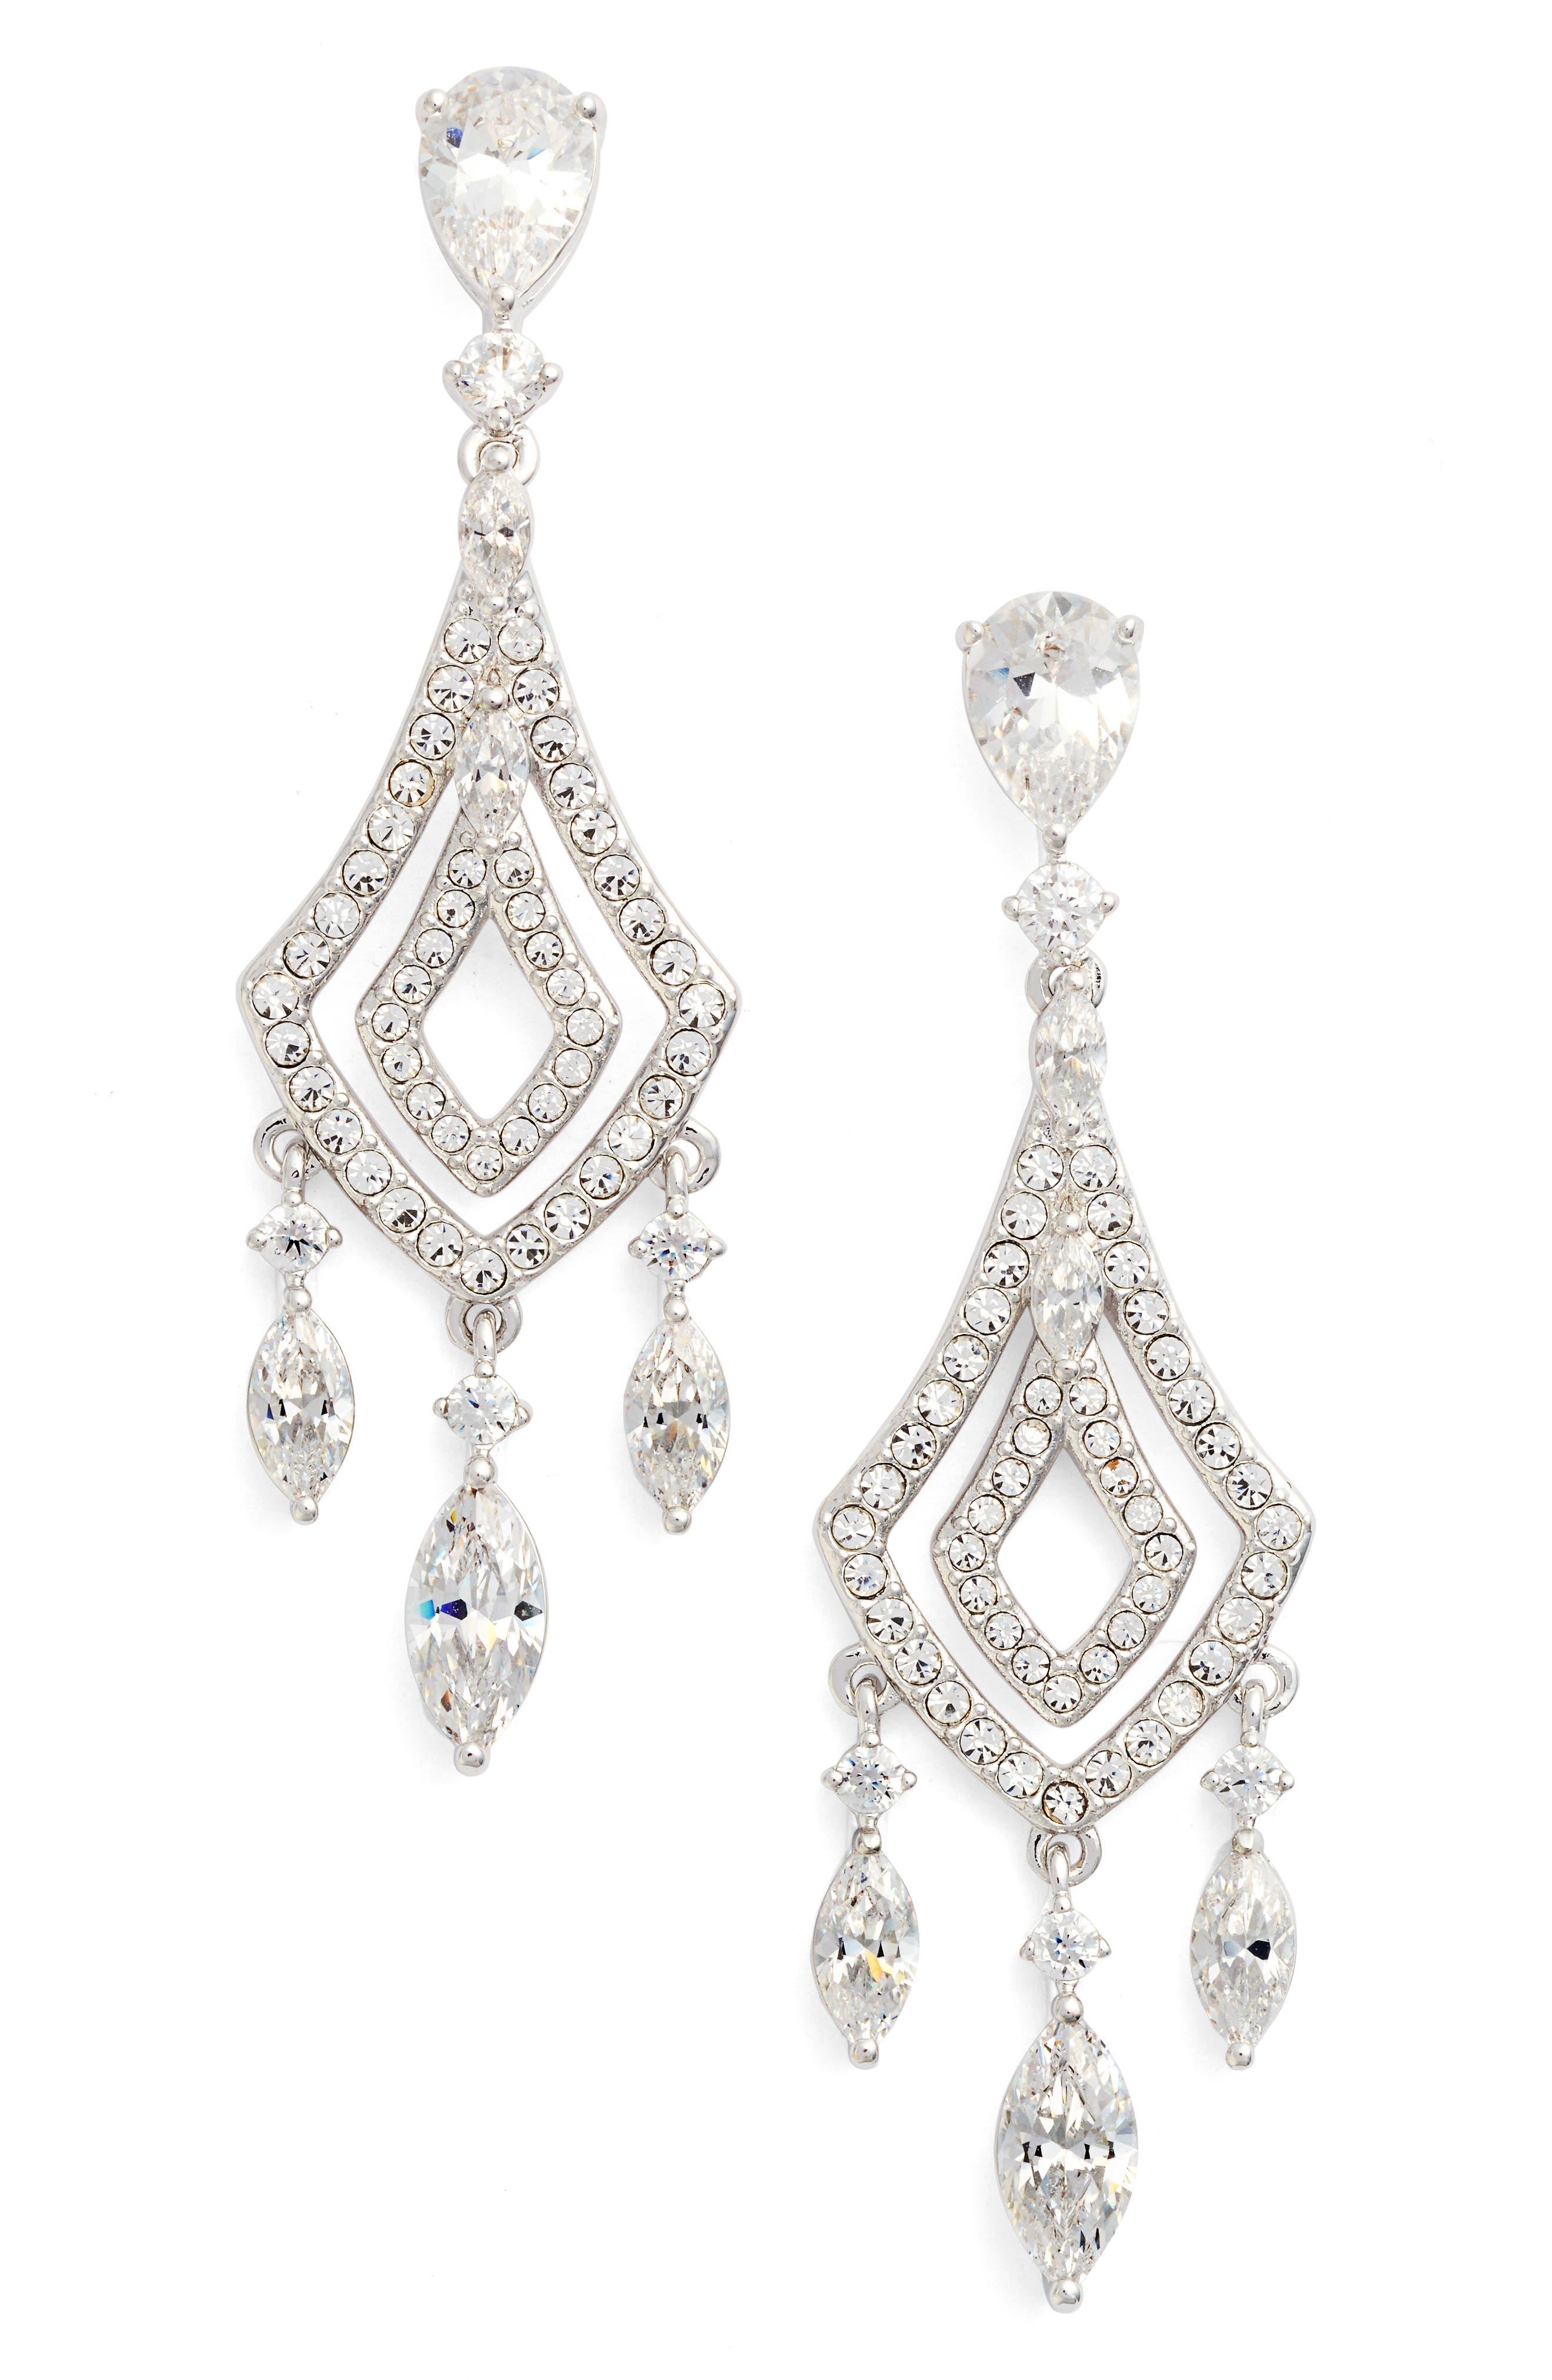 Alternate Image 1 Selected - Nadri Cubic Zirconia Chandelier Earrings